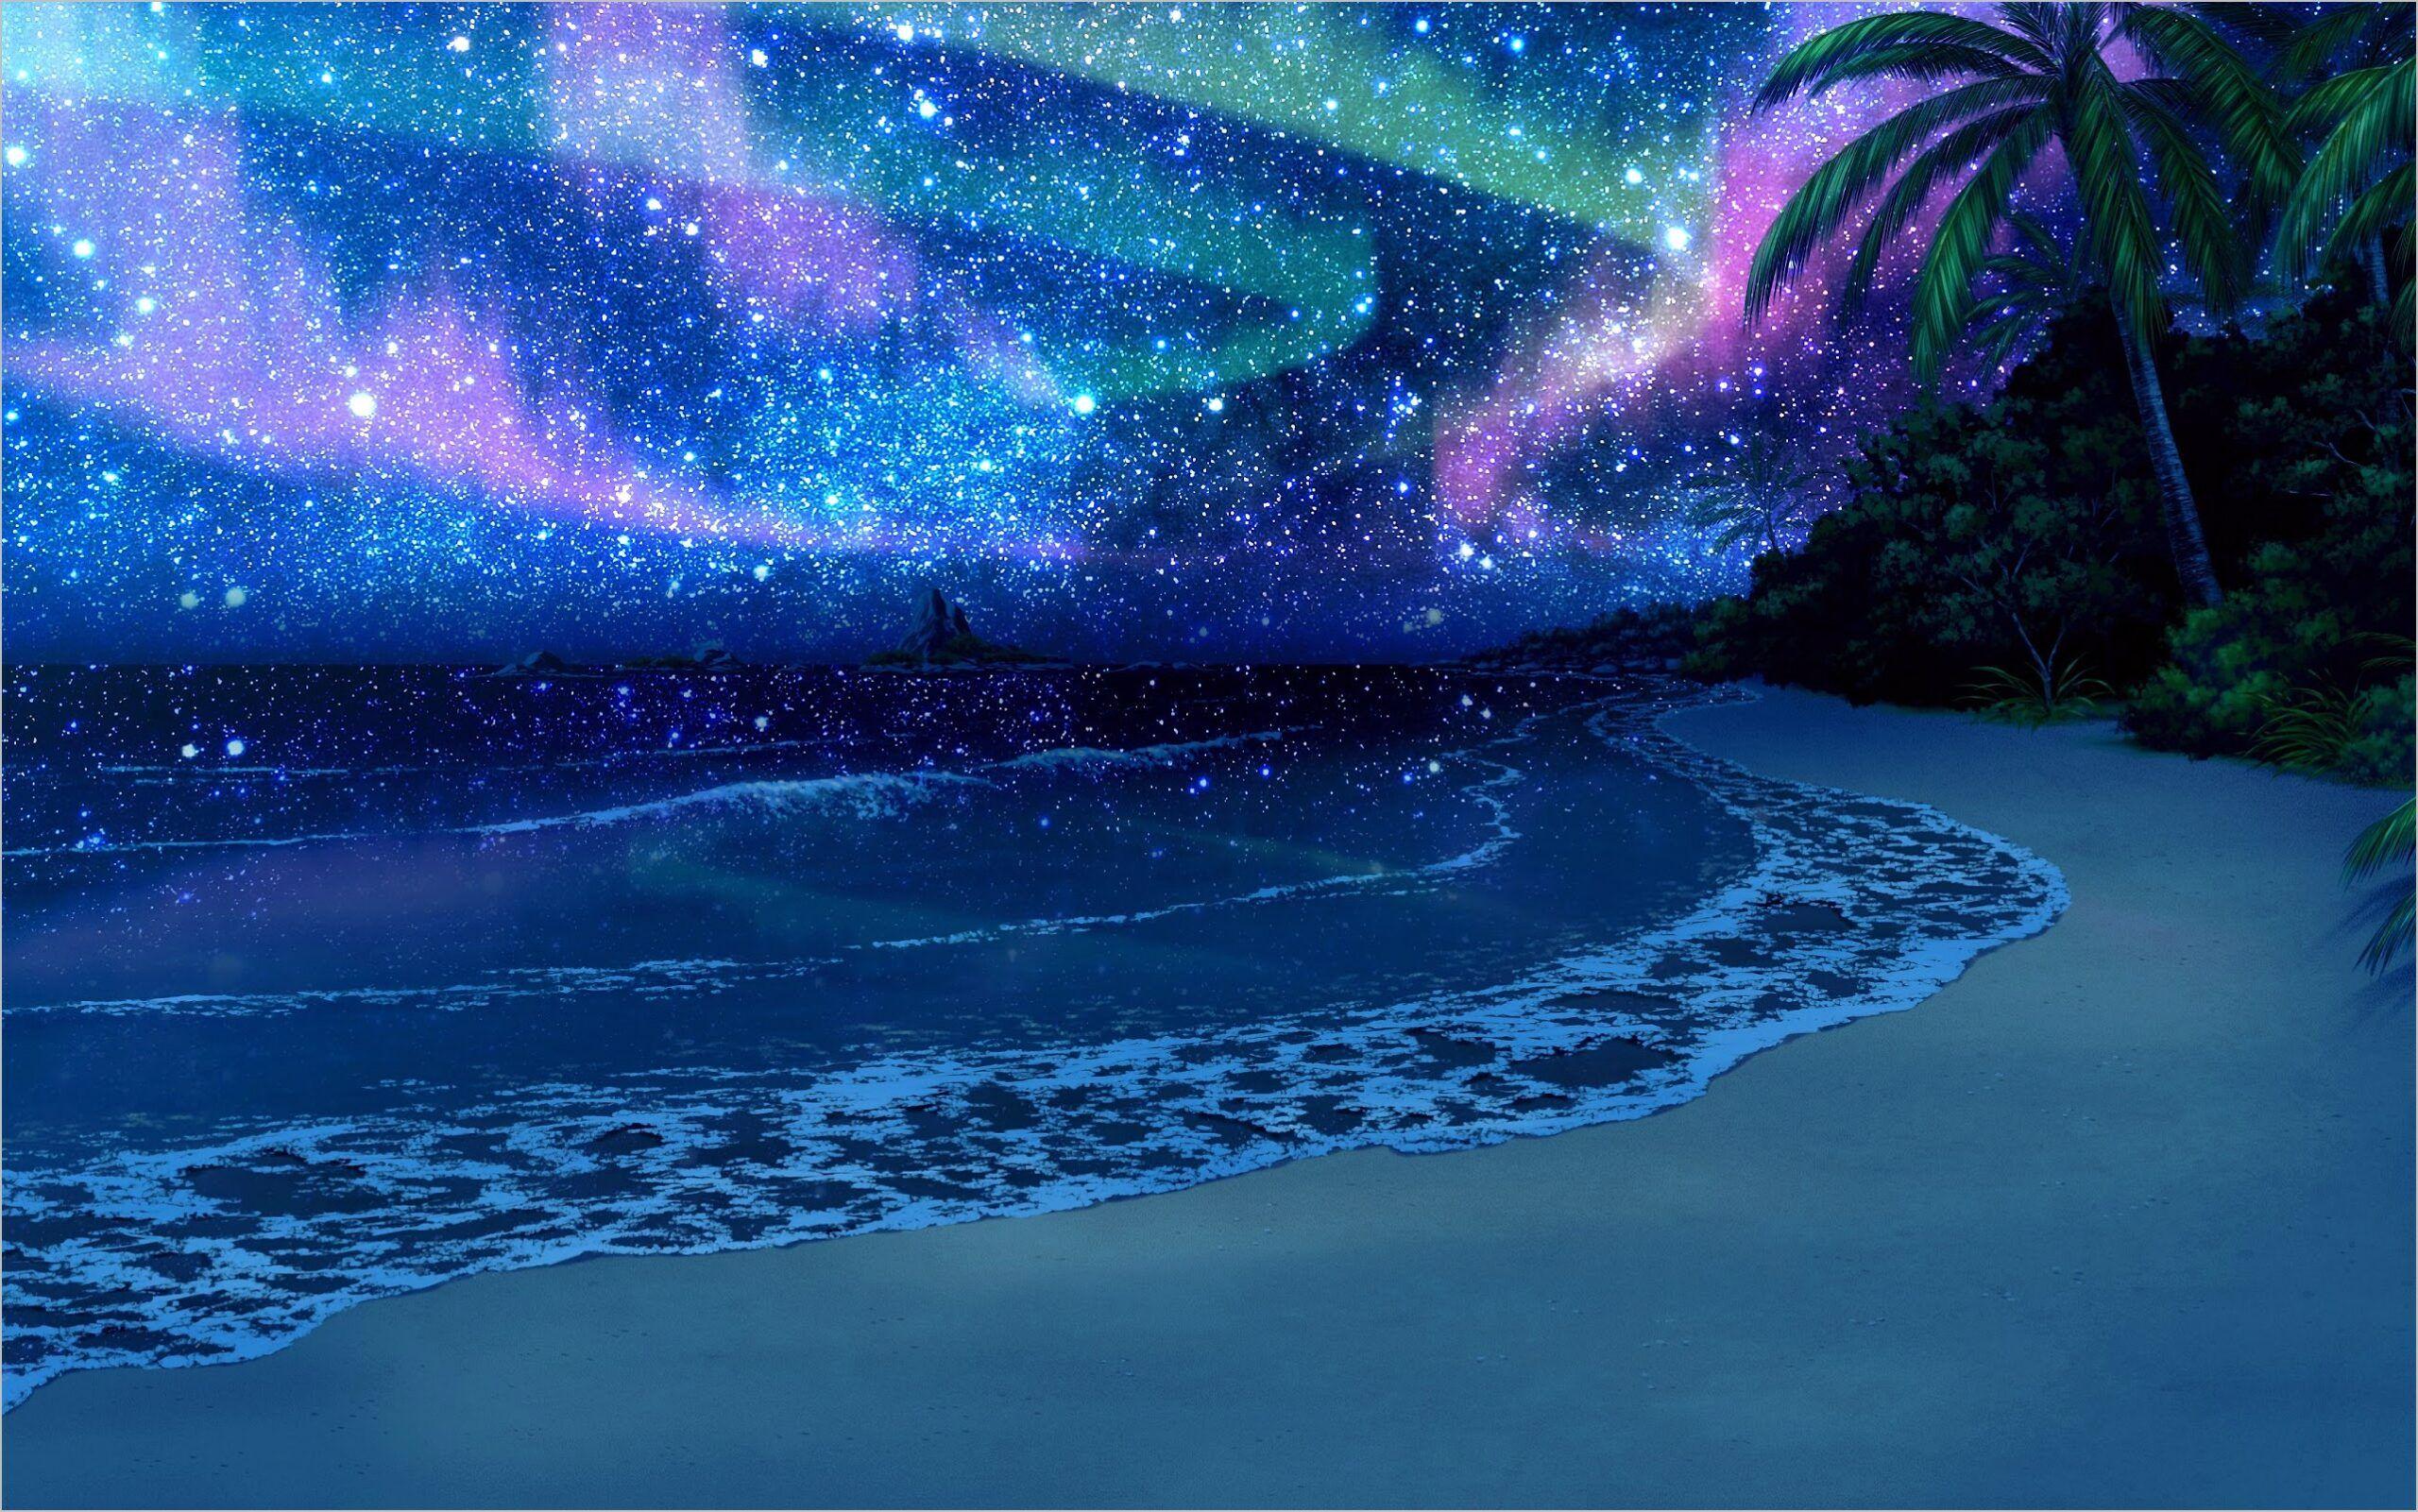 Beach An Night Wallpaper 4k In 2020 Anime Scenery Anime Background Anime Scenery Wallpaper